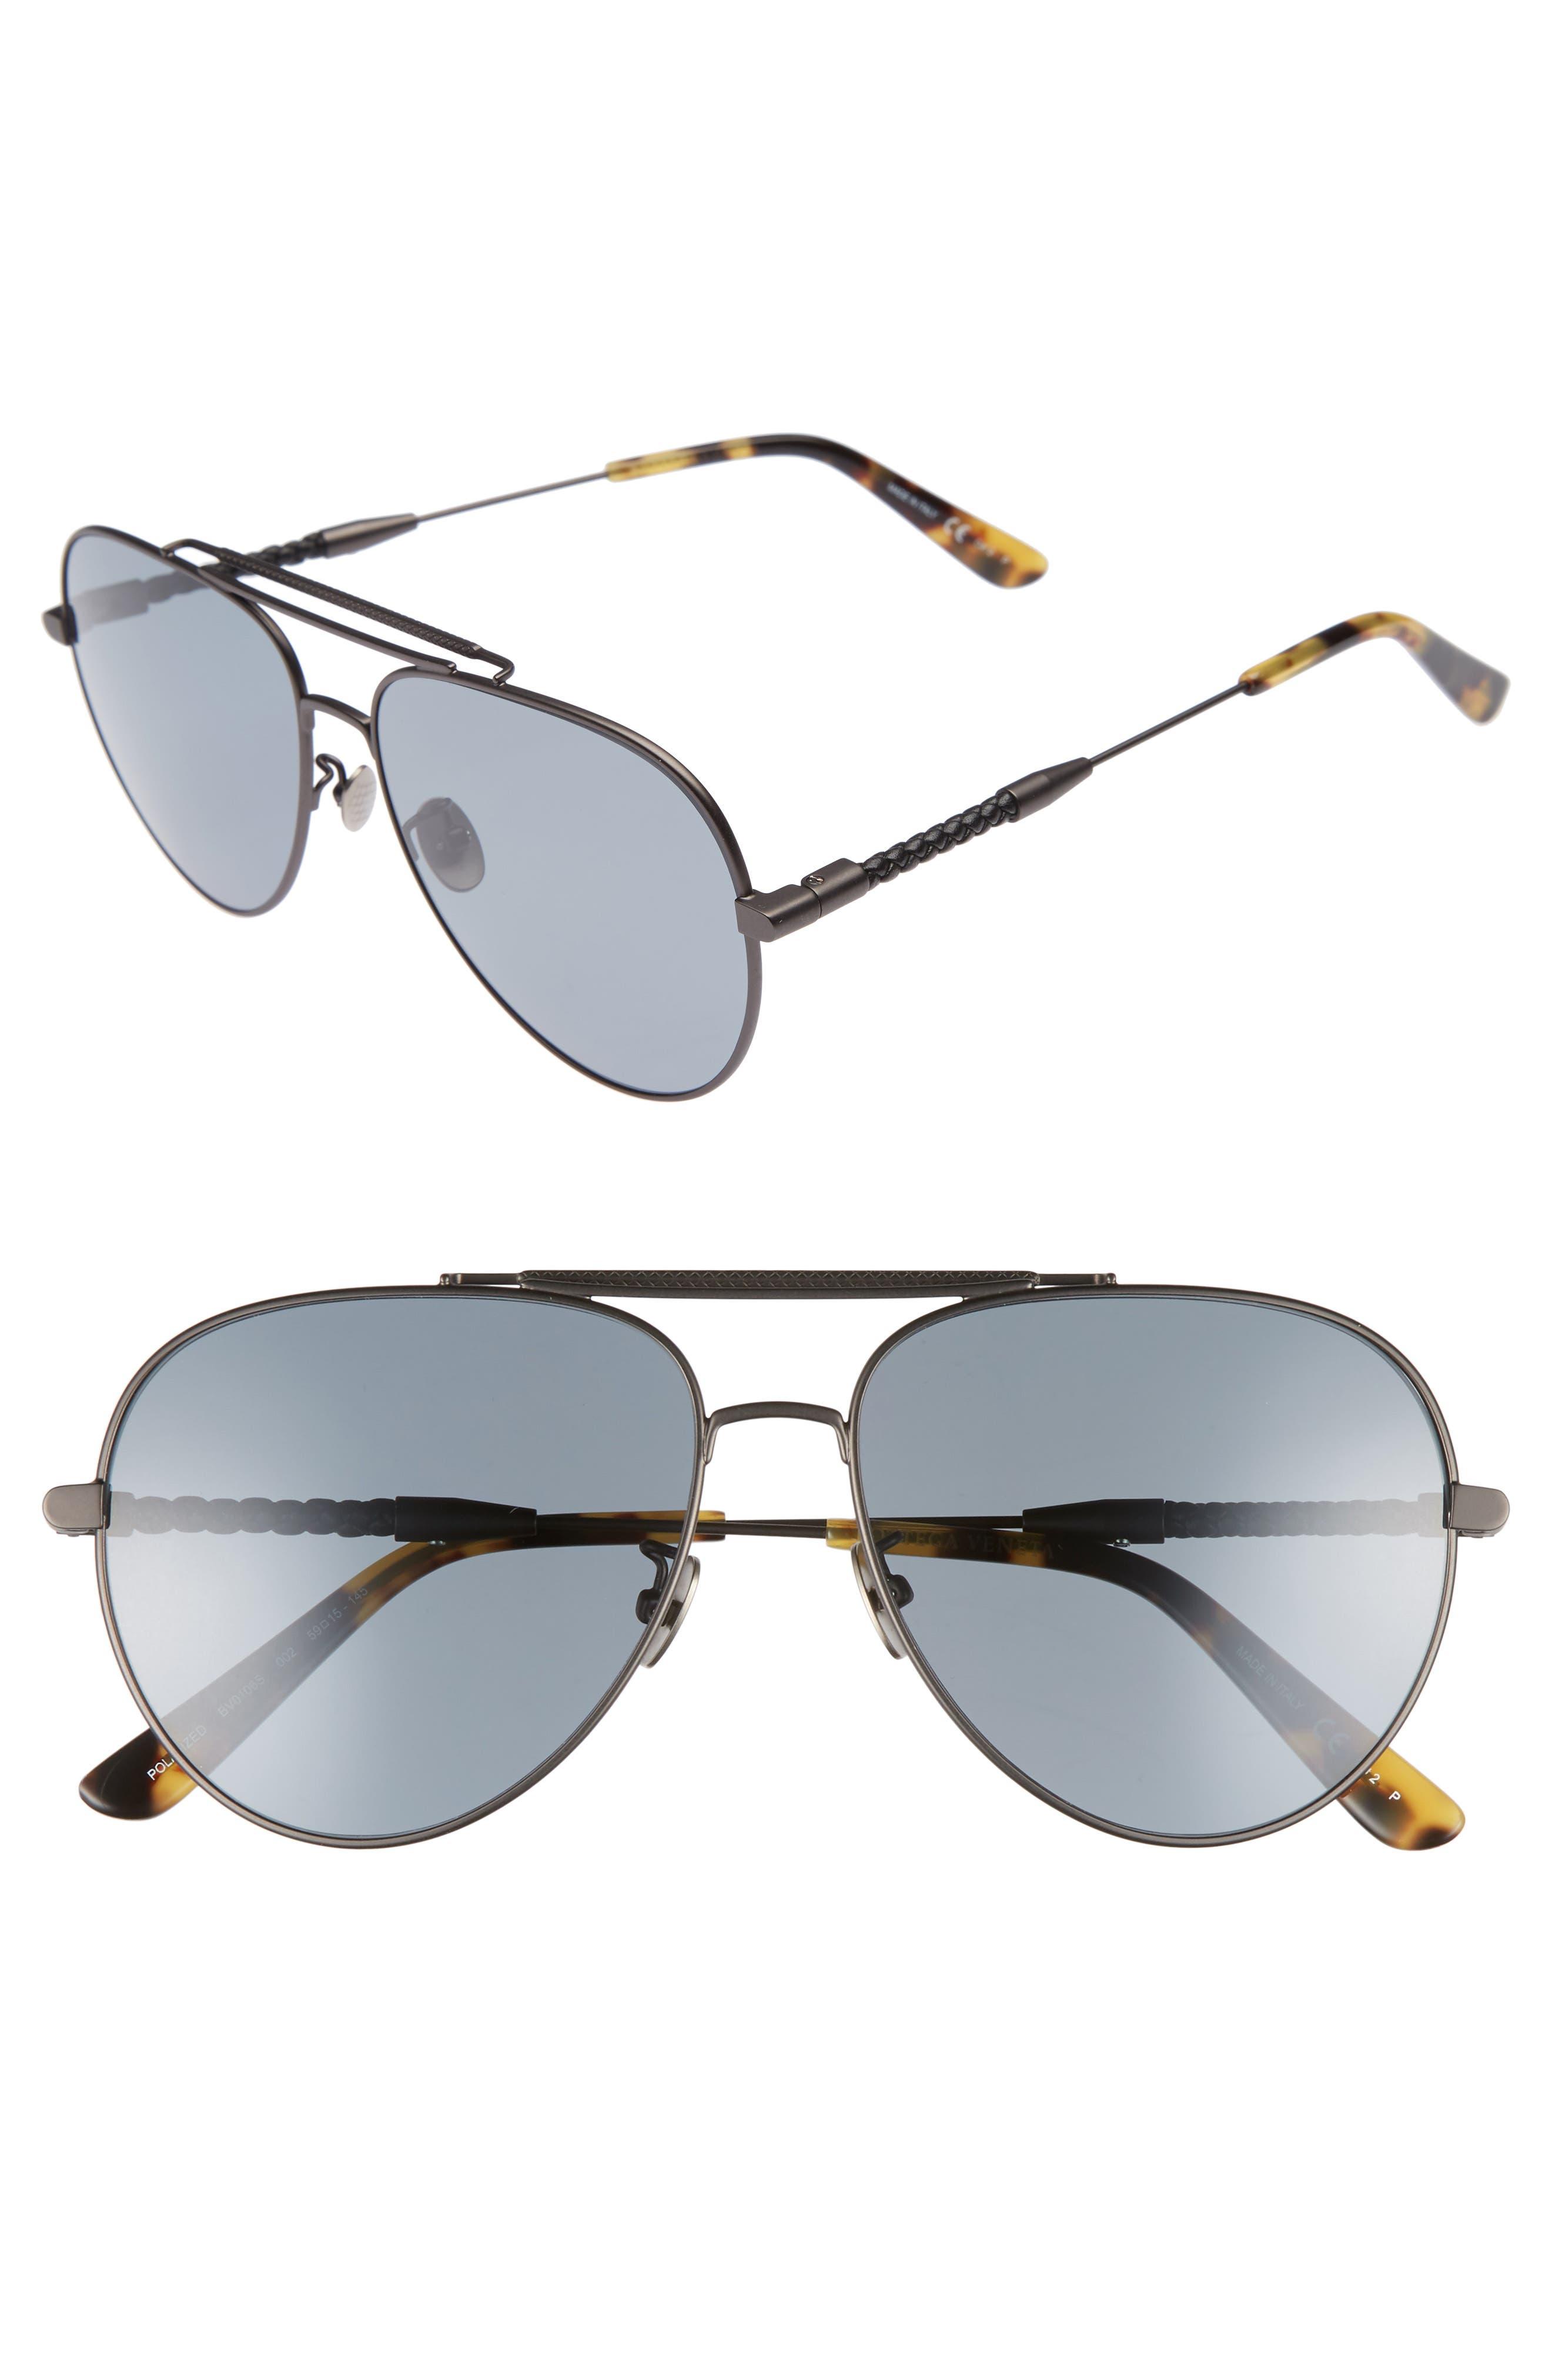 59m Polarized Aviator Sunglasses,                         Main,                         color,